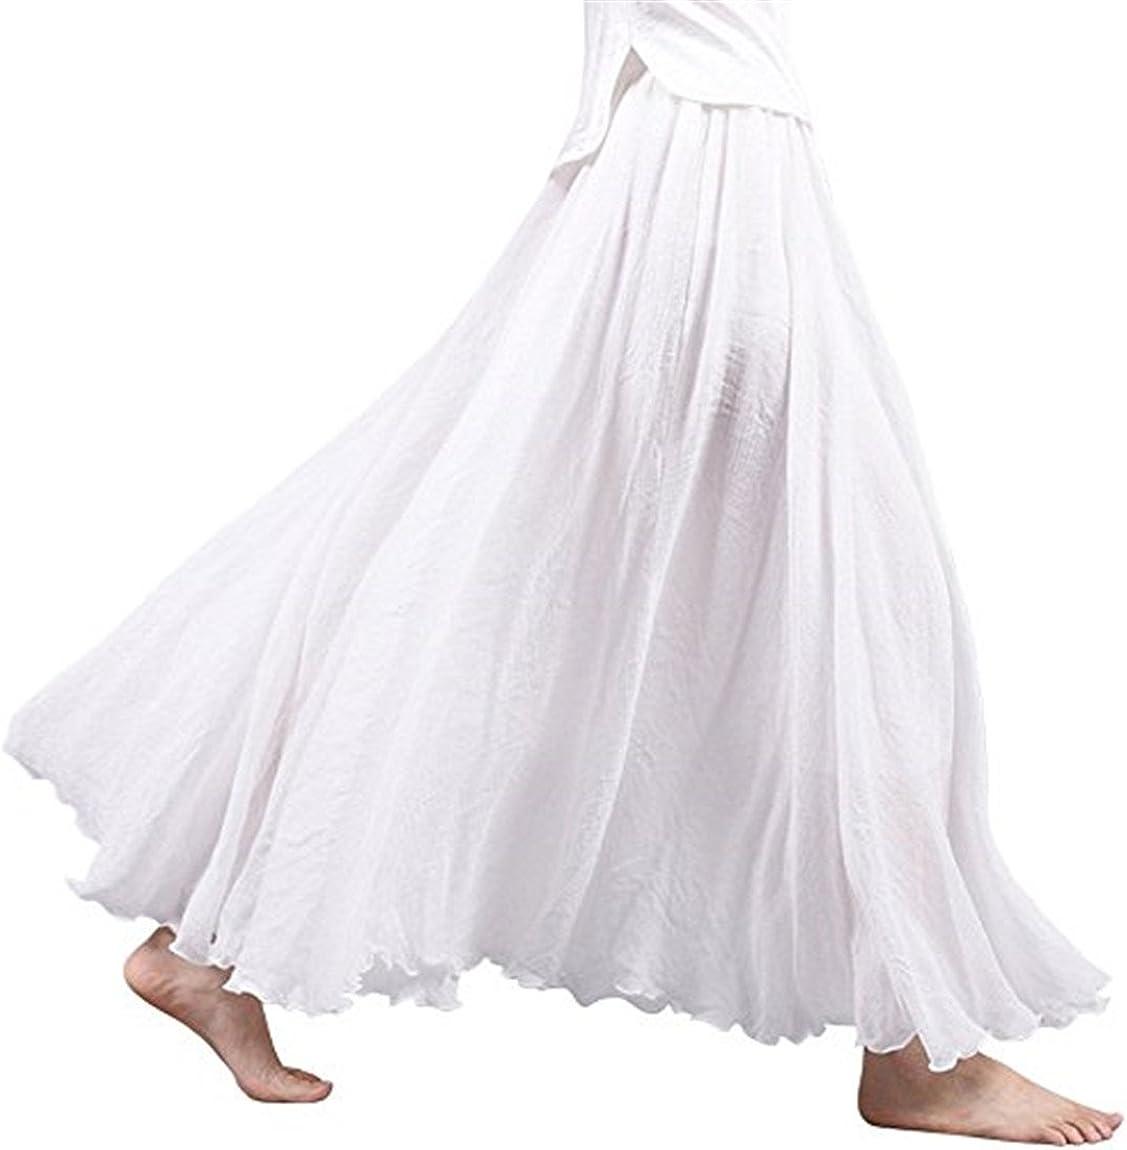 SERAIALDA Women's Elastic Waist Bohemian Style Solid Color Band Cotton Linen Long Maxi Skirt Dress